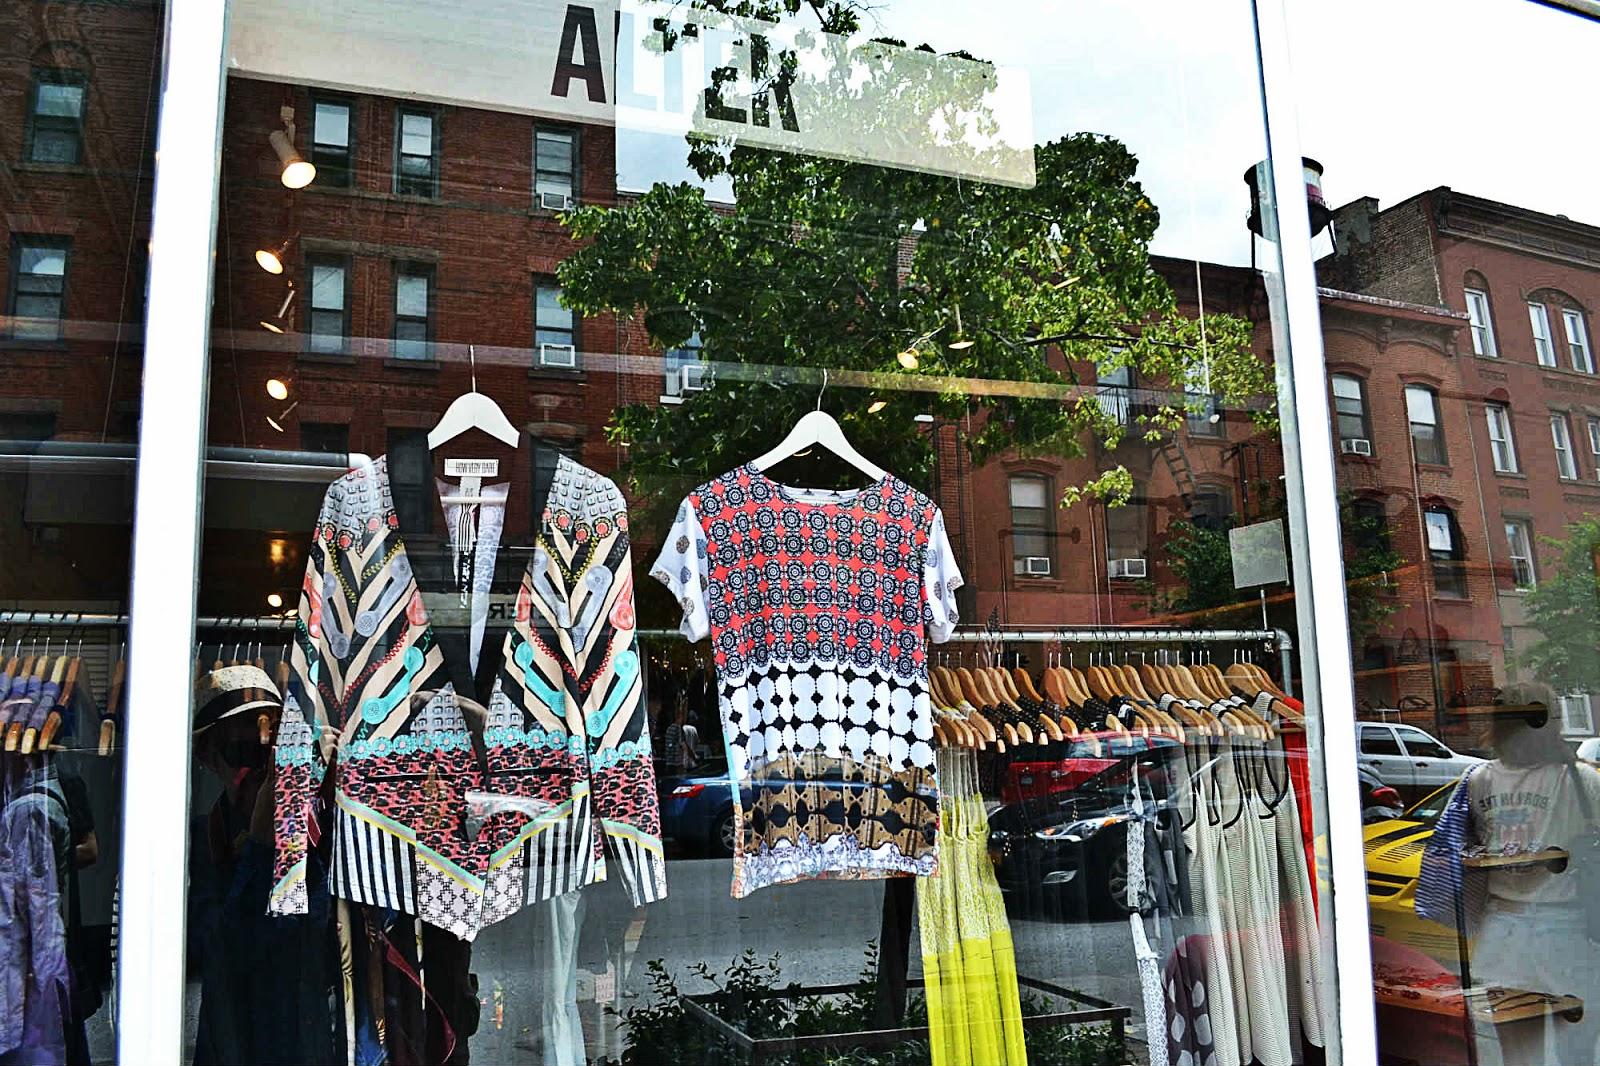 Hombres g suspensorio jock cadena correa tanga ropa for Hombre sexis en ropa interior